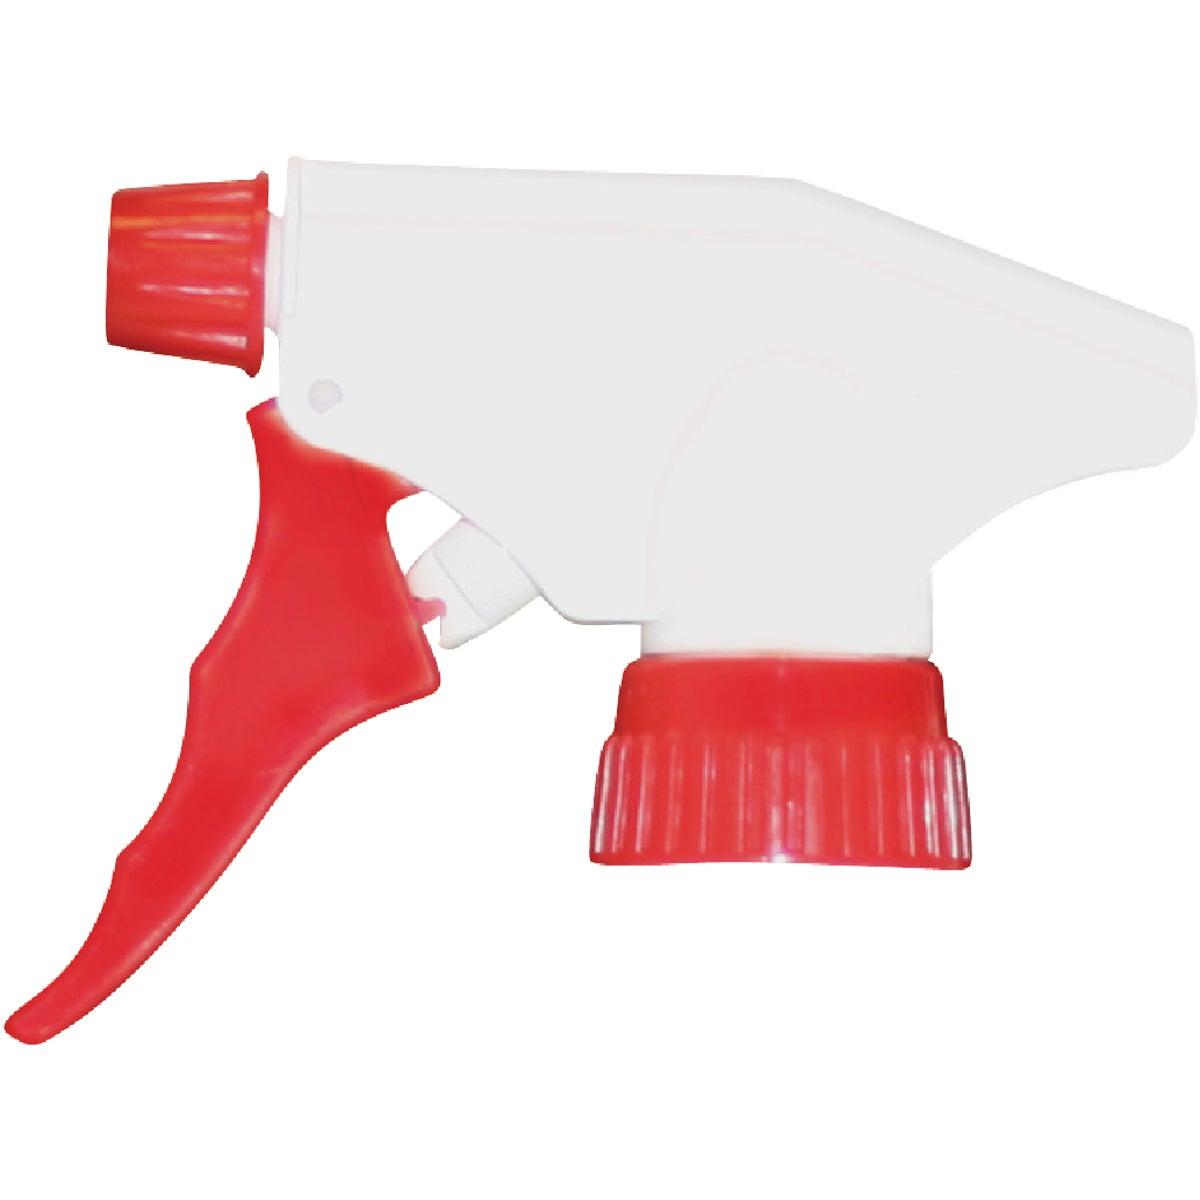 Replacement Sprayer Head